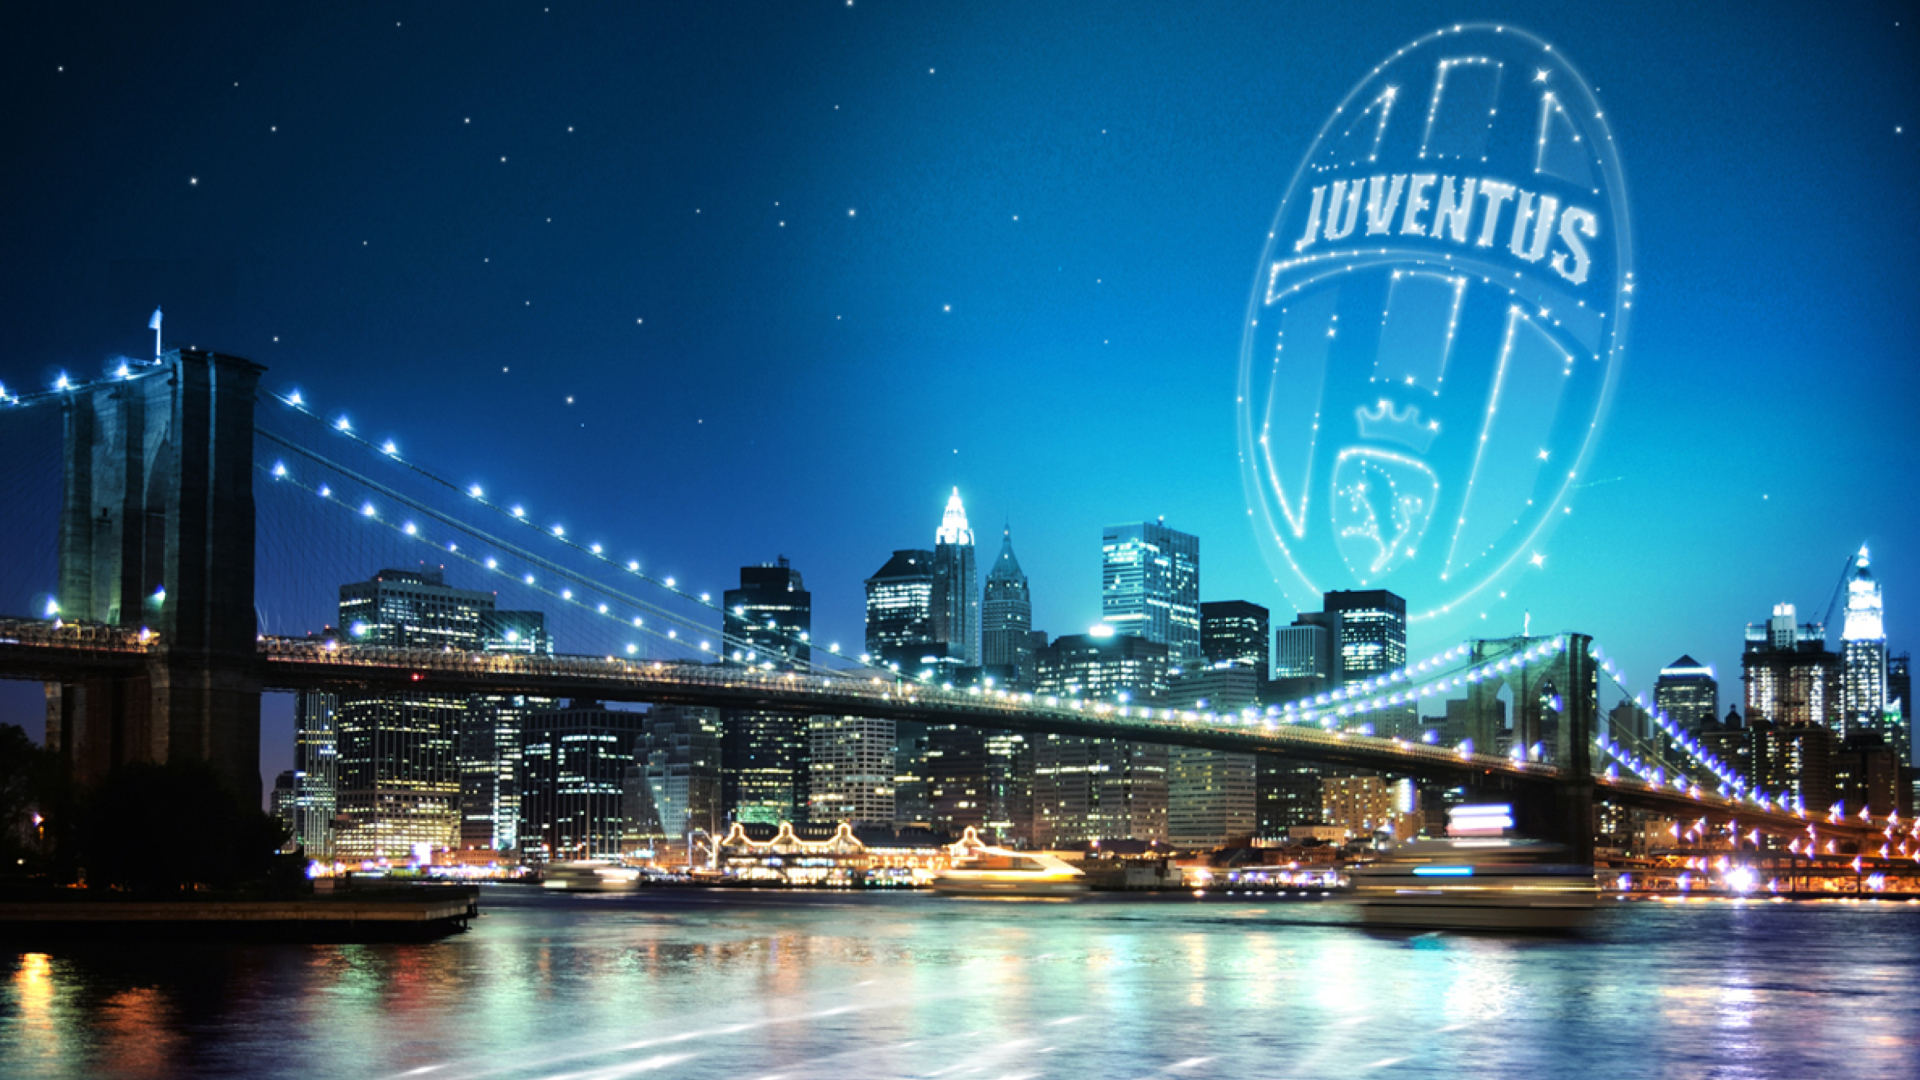 Juventus sfondi gratuiti per desktop 1920x1080 full hd for Foto full hd per desktop